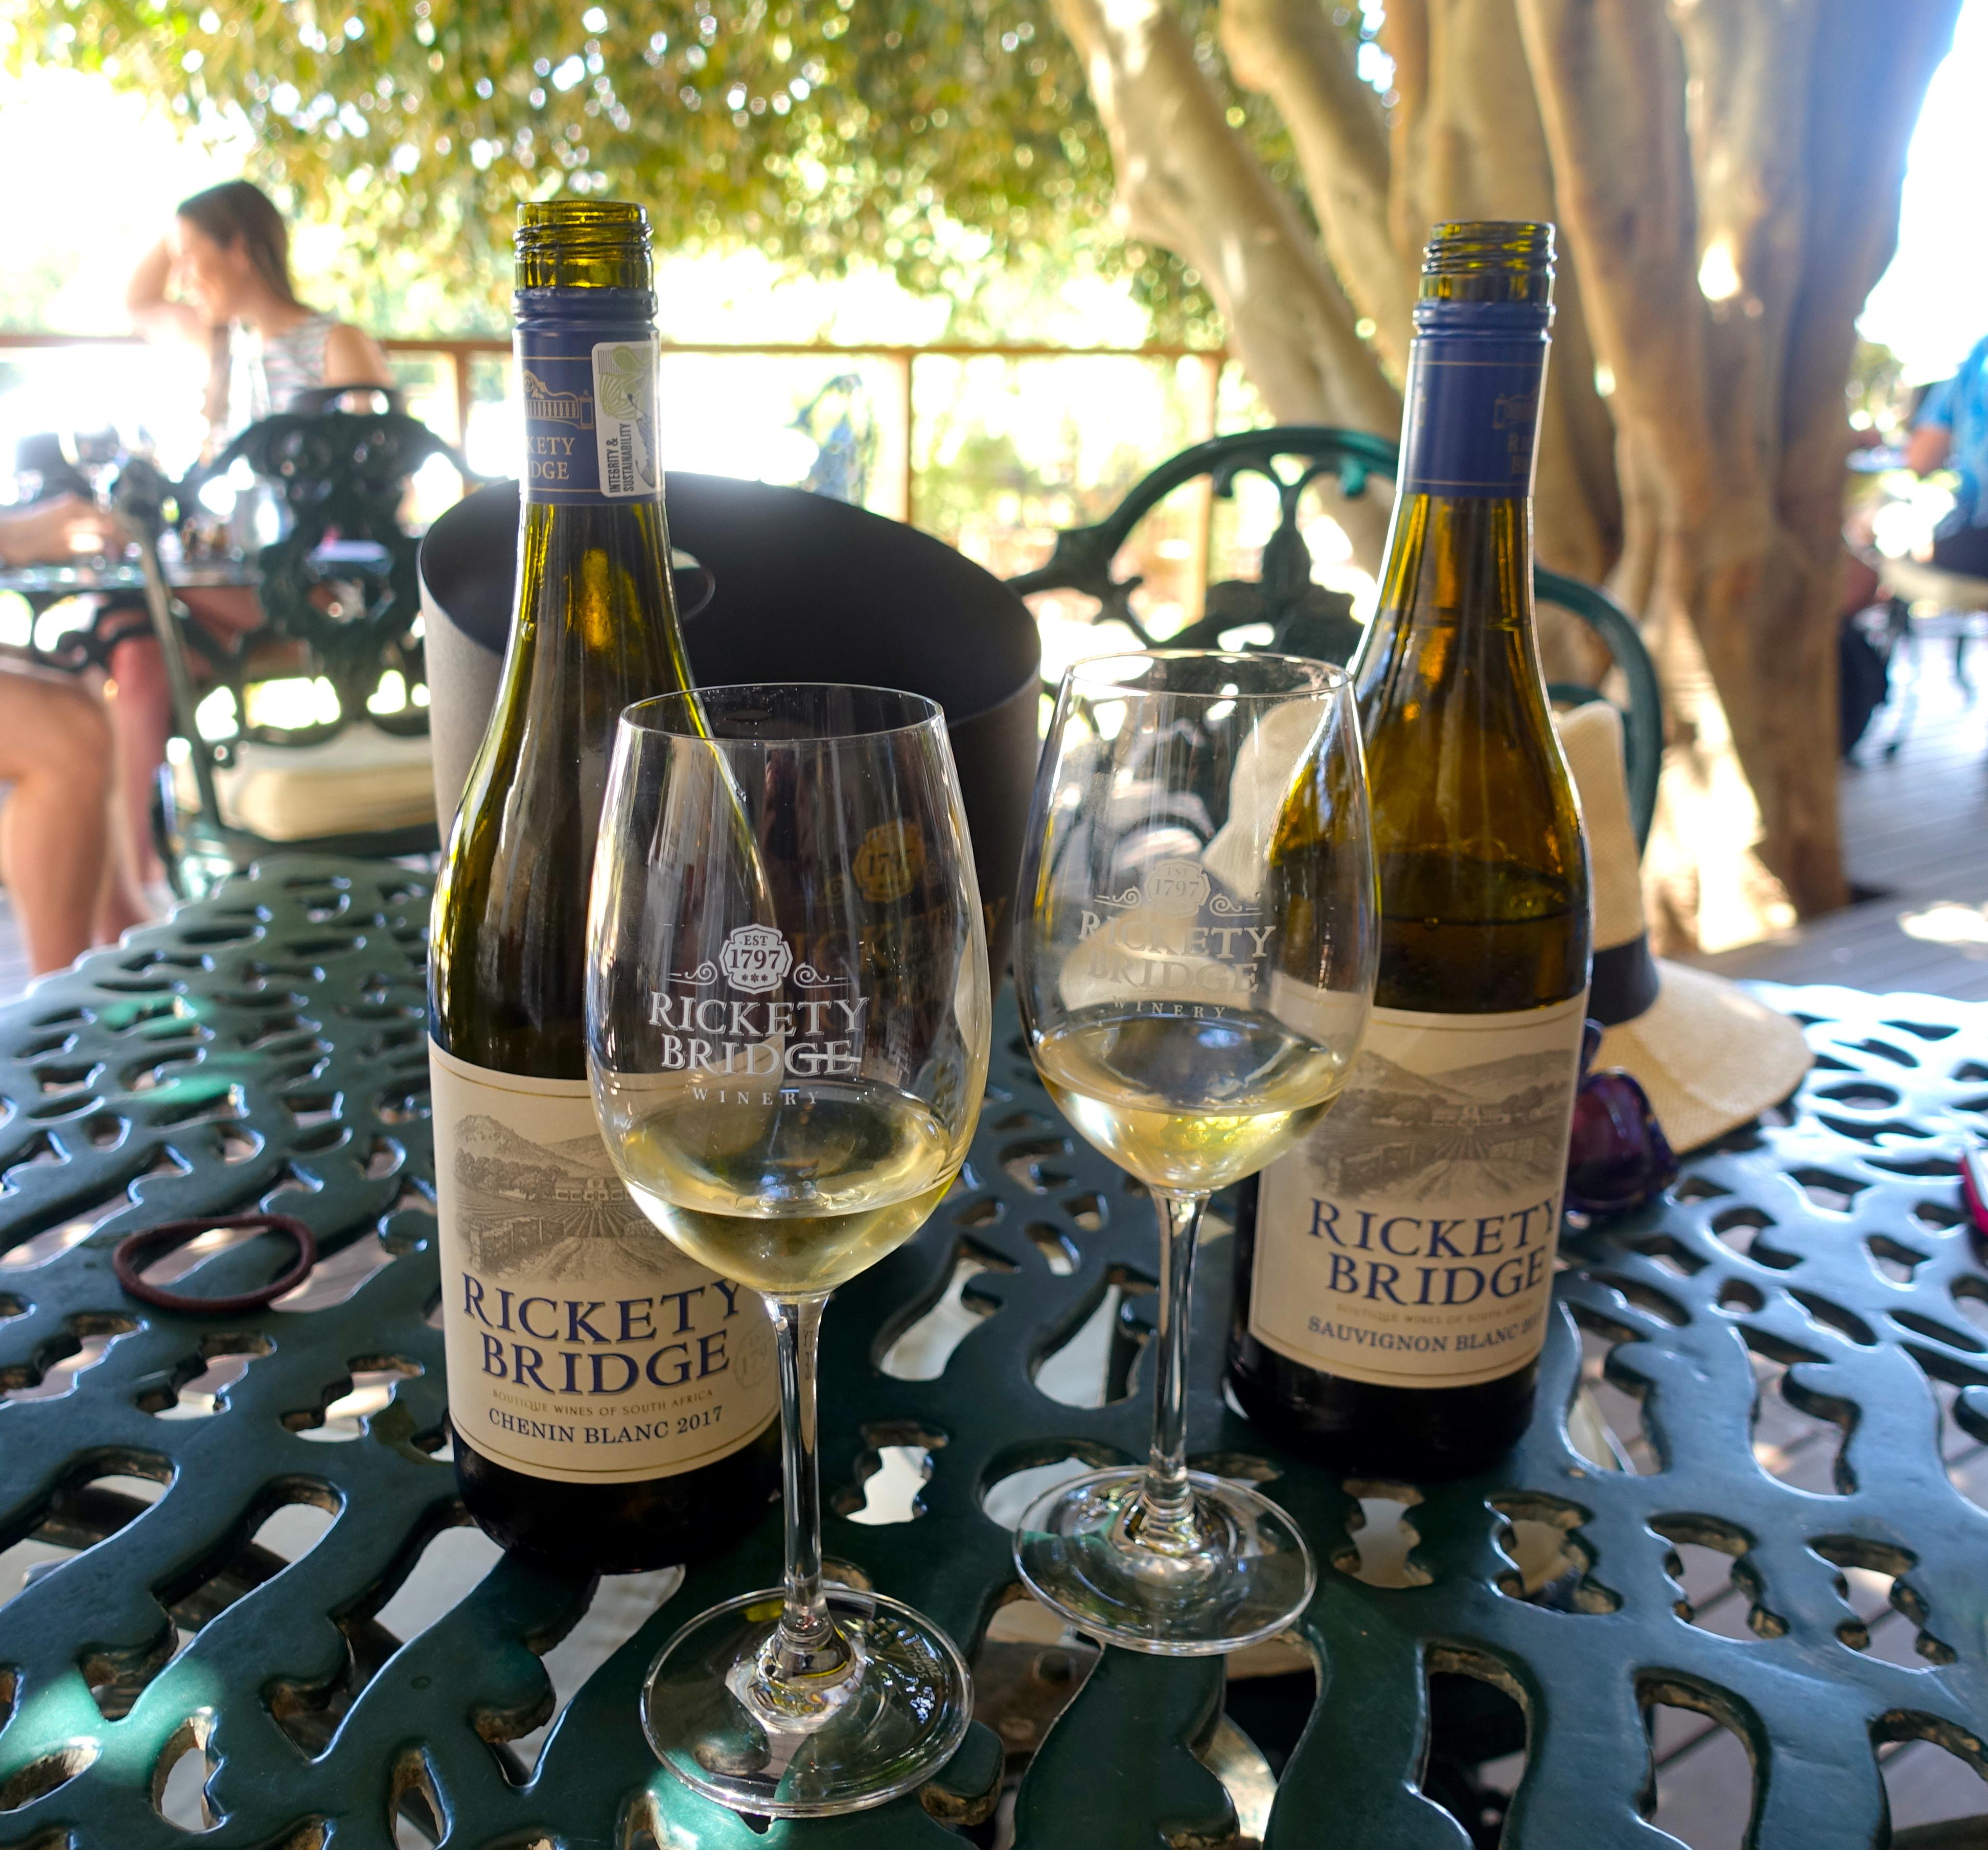 chenin-blanc-rickety-bridge-winery-lustforthesublime